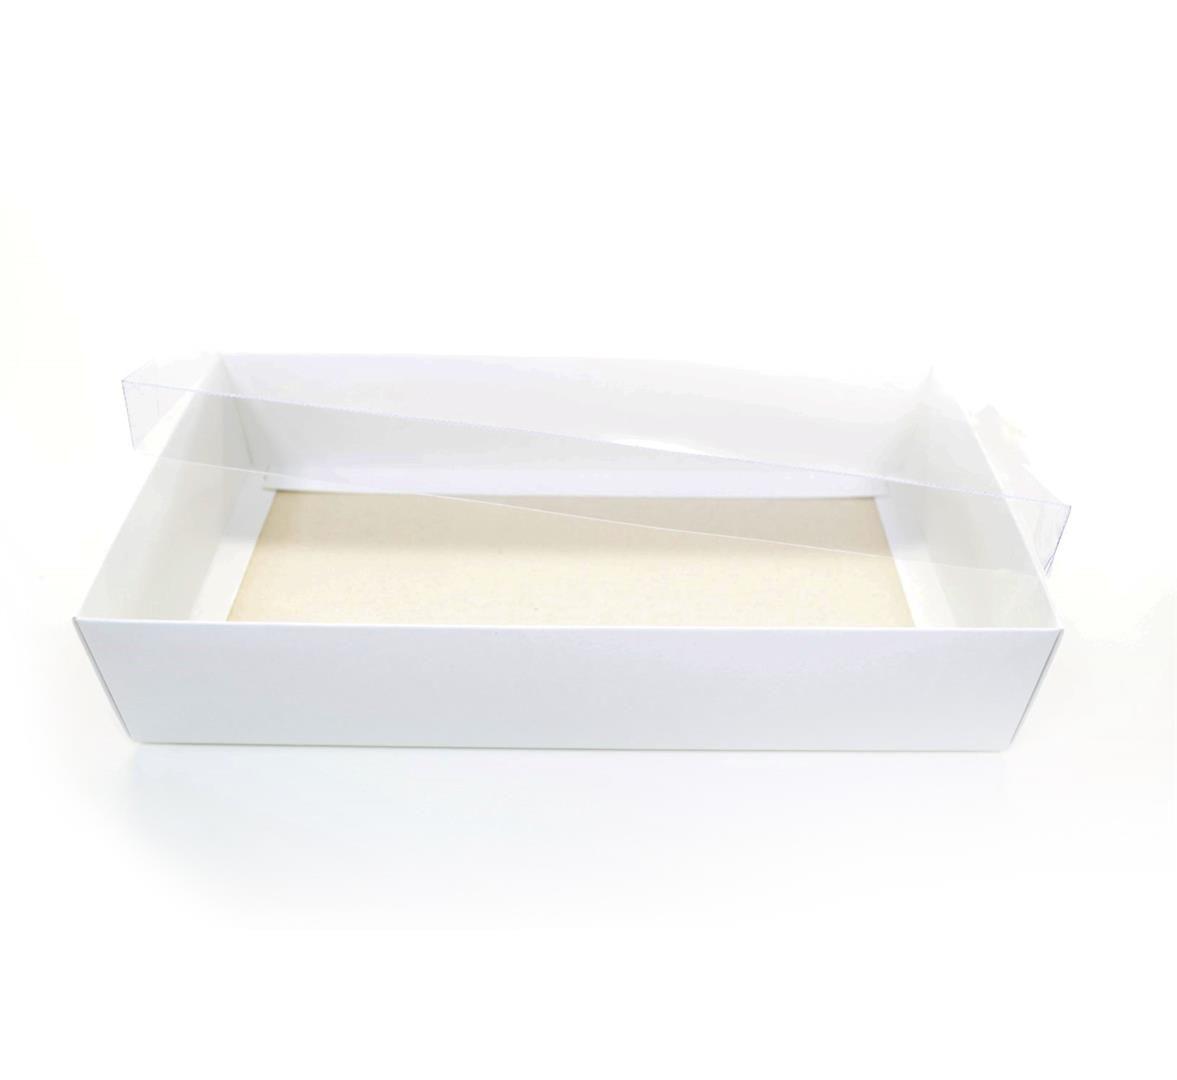 Ref 005 Branca - Caixa c/ tampa Transparente BAIXA - 25x13x5 cm - c/ 10 unidades